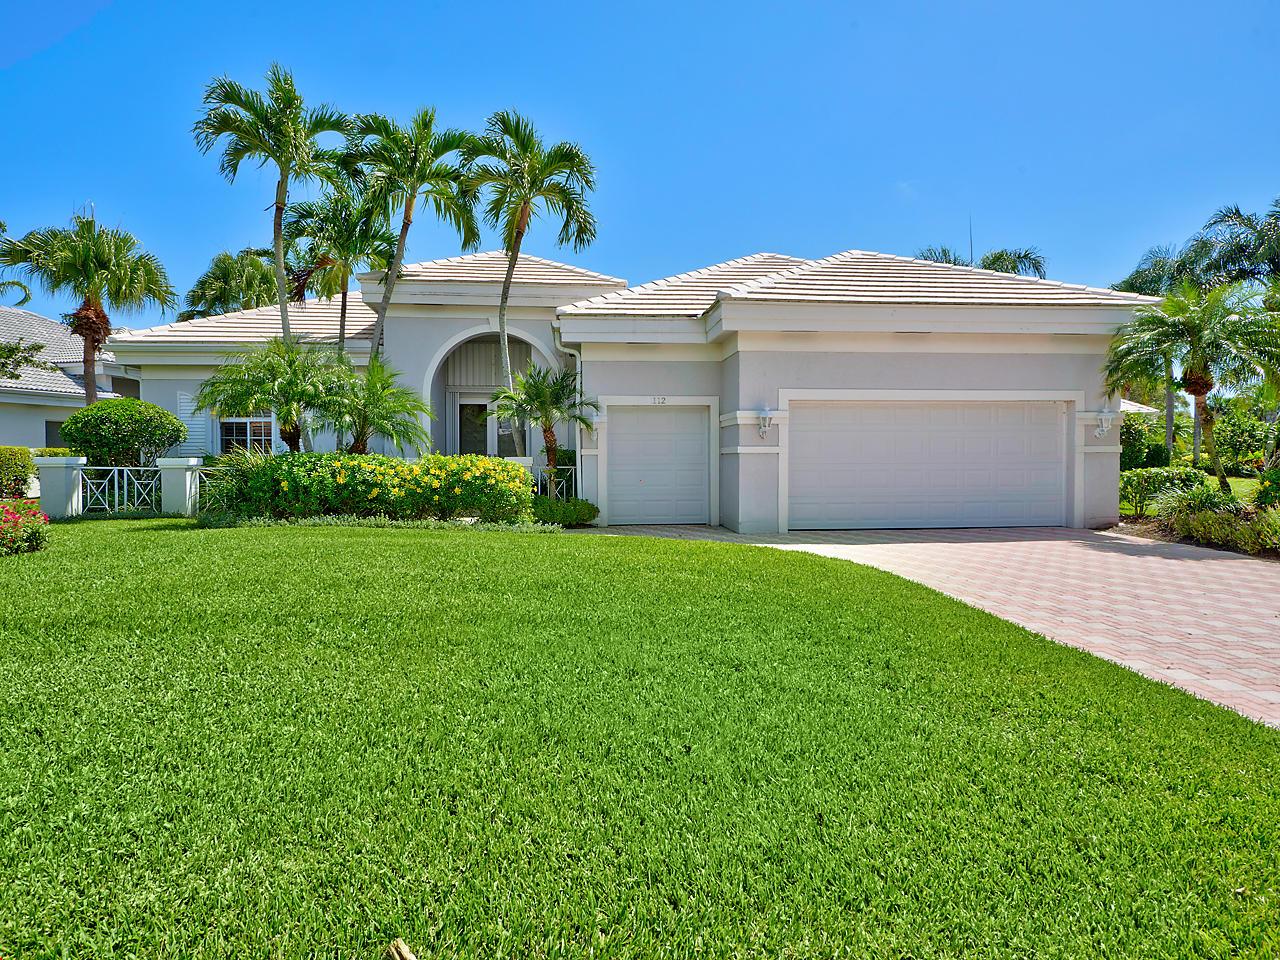 112 Emerald Key Lane, Palm Beach Gardens, Florida 33418, 3 Bedrooms Bedrooms, ,3 BathroomsBathrooms,A,Single family,Emerald Key,RX-10504624